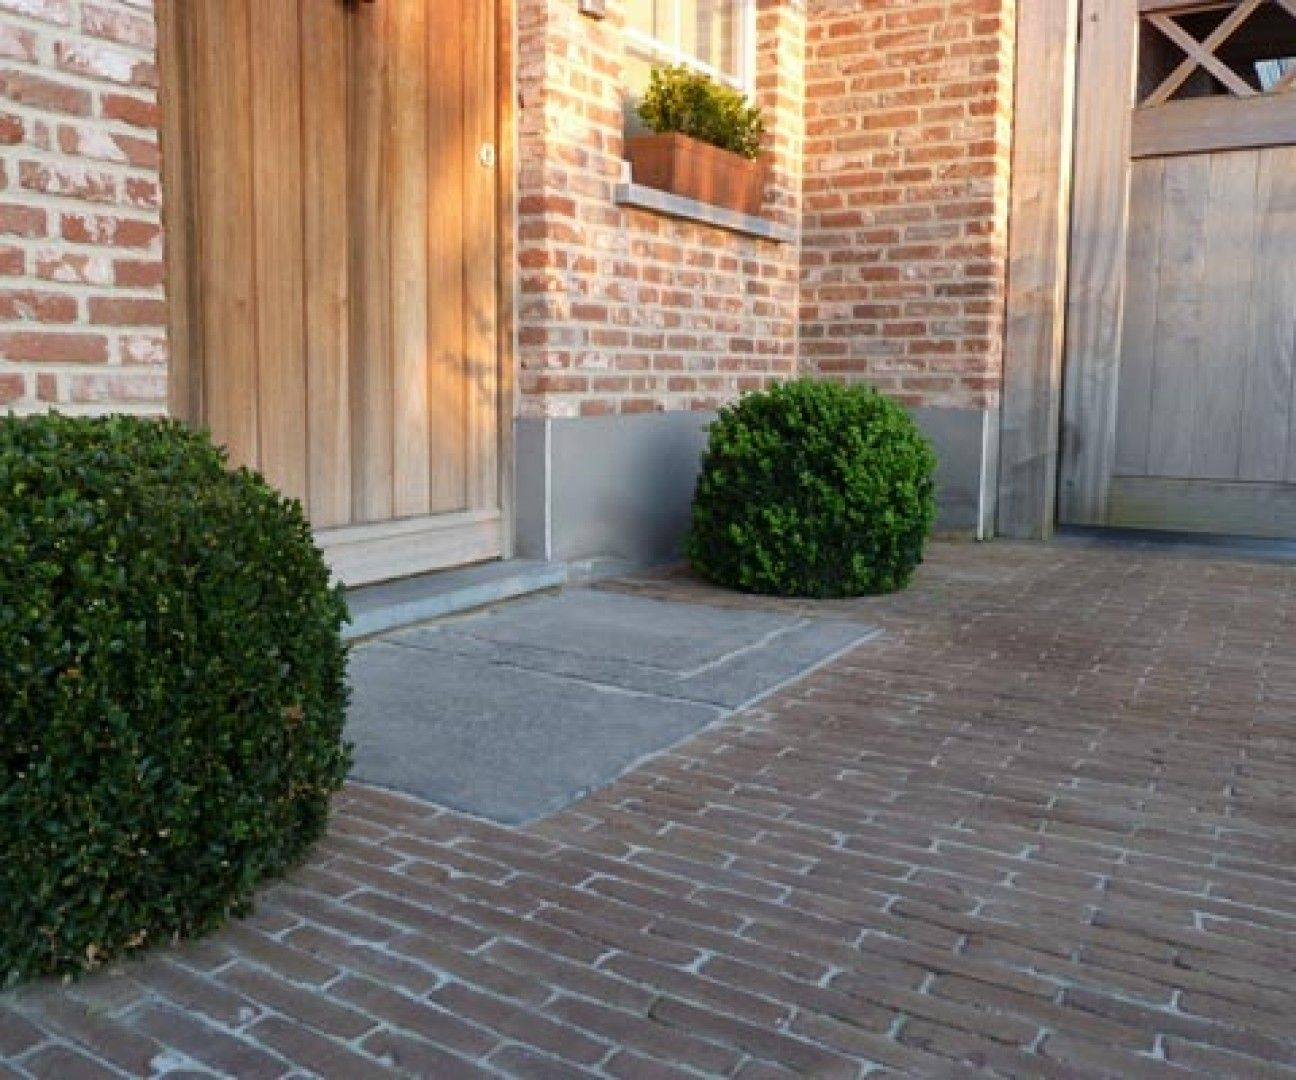 pin von claudia auf home pinterest pflaster terrasse. Black Bedroom Furniture Sets. Home Design Ideas